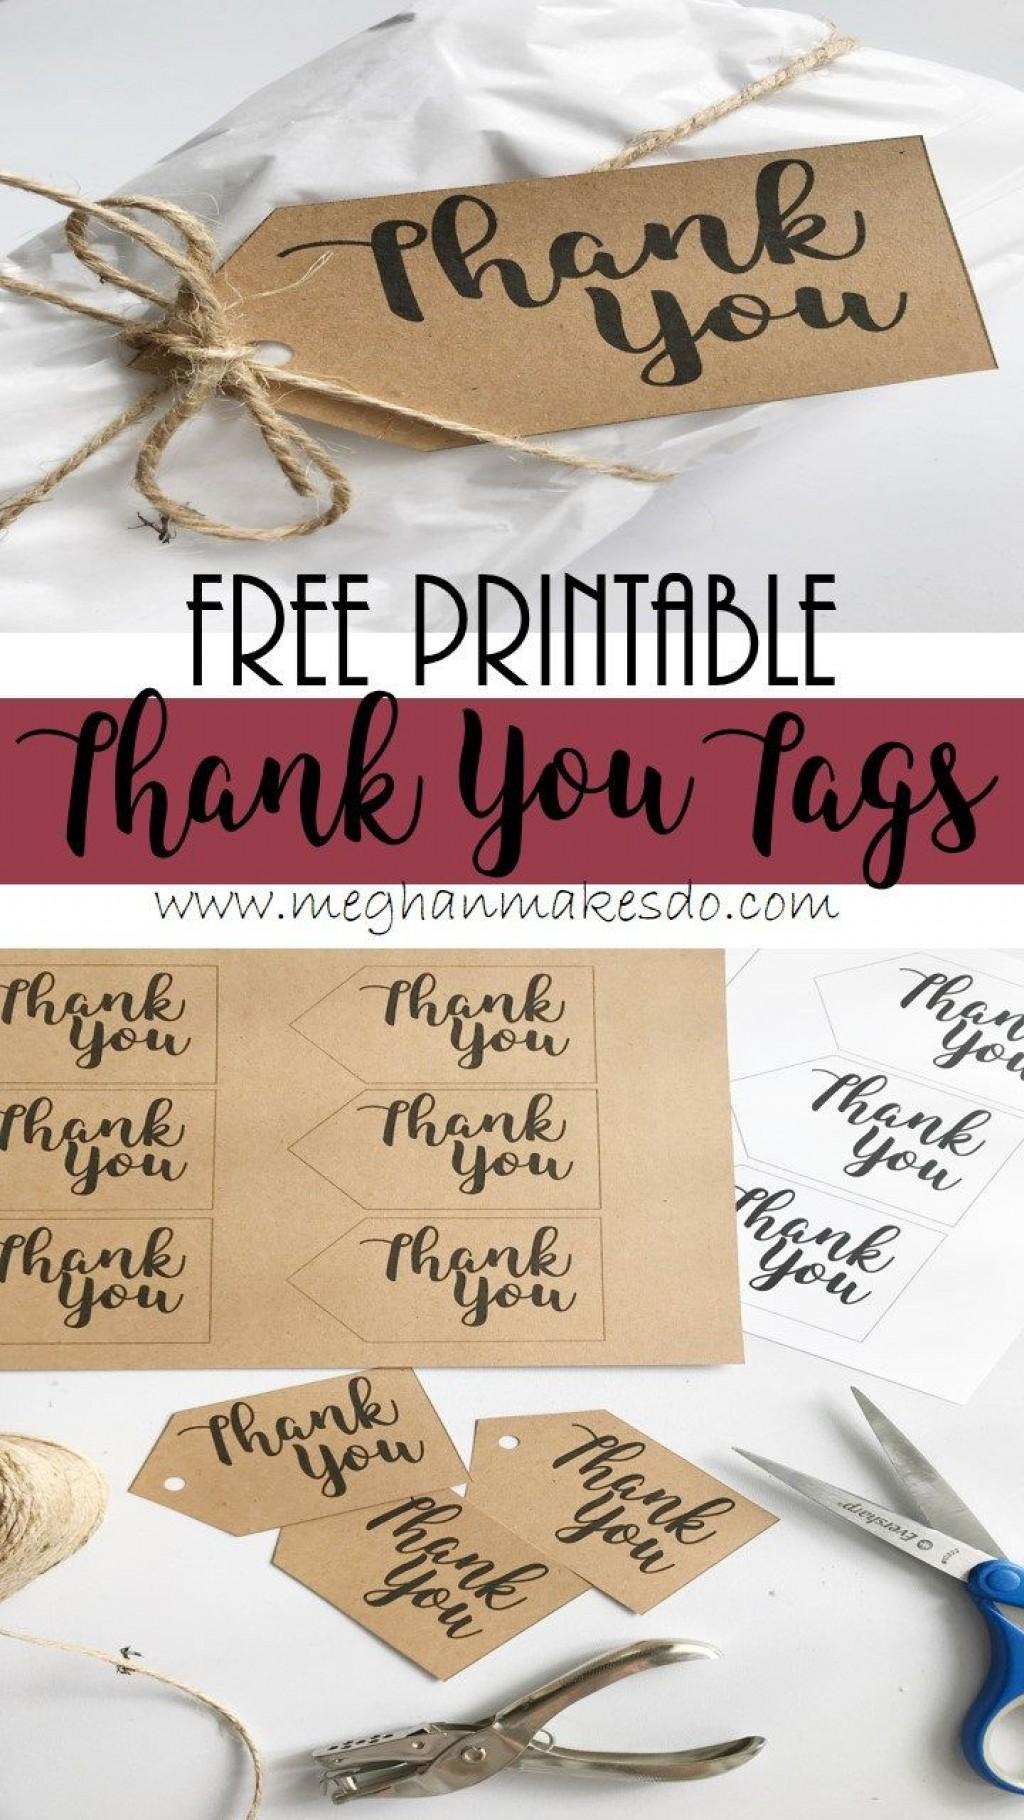 011 Fascinating Free Printable Thank You Gift Tag Template Sample  TemplatesLarge